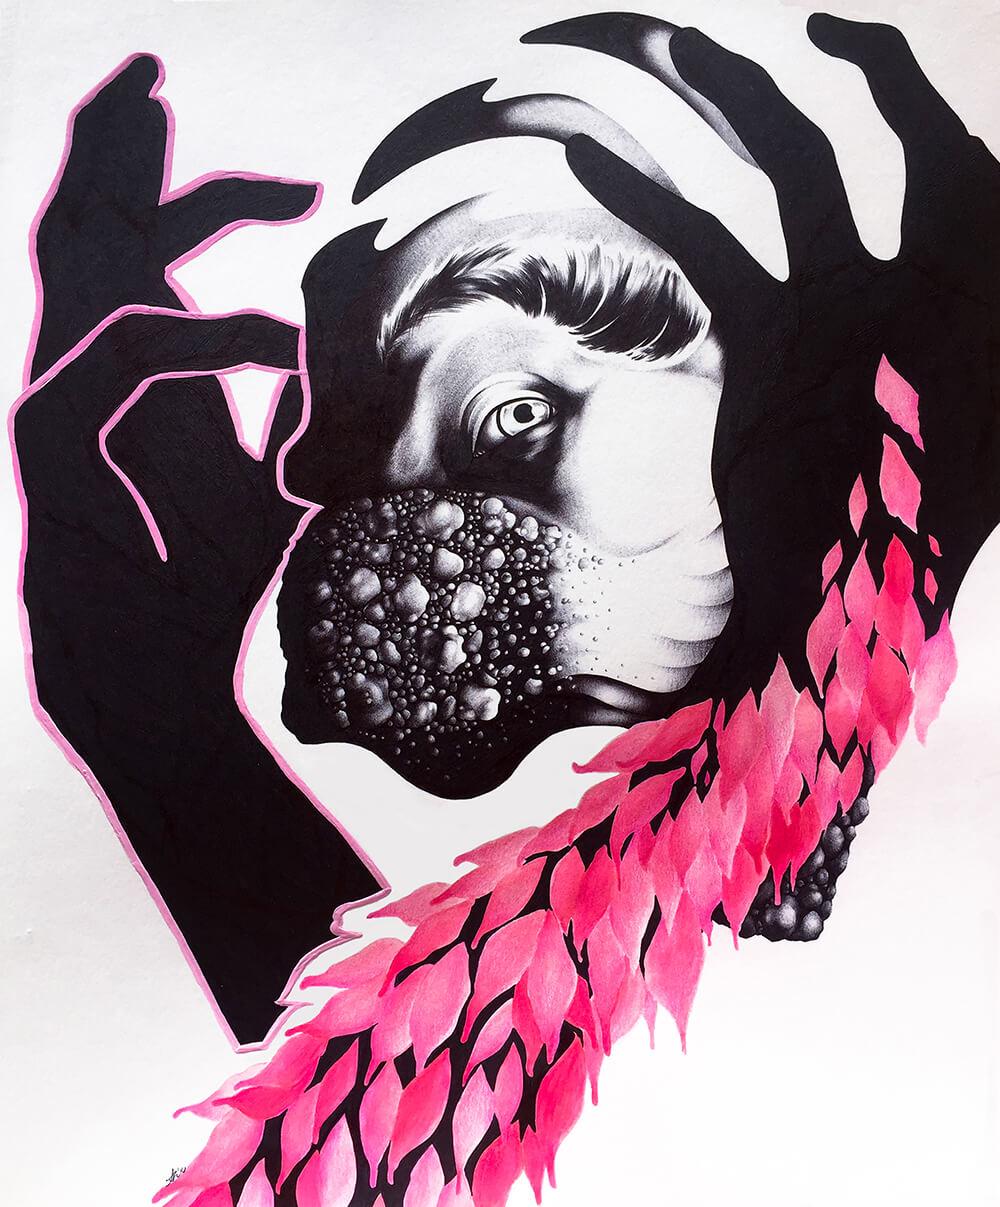 Creature #2     Medium: Black Ballpoint Pen, Watercolor, Colored Pencil, and G  ouache